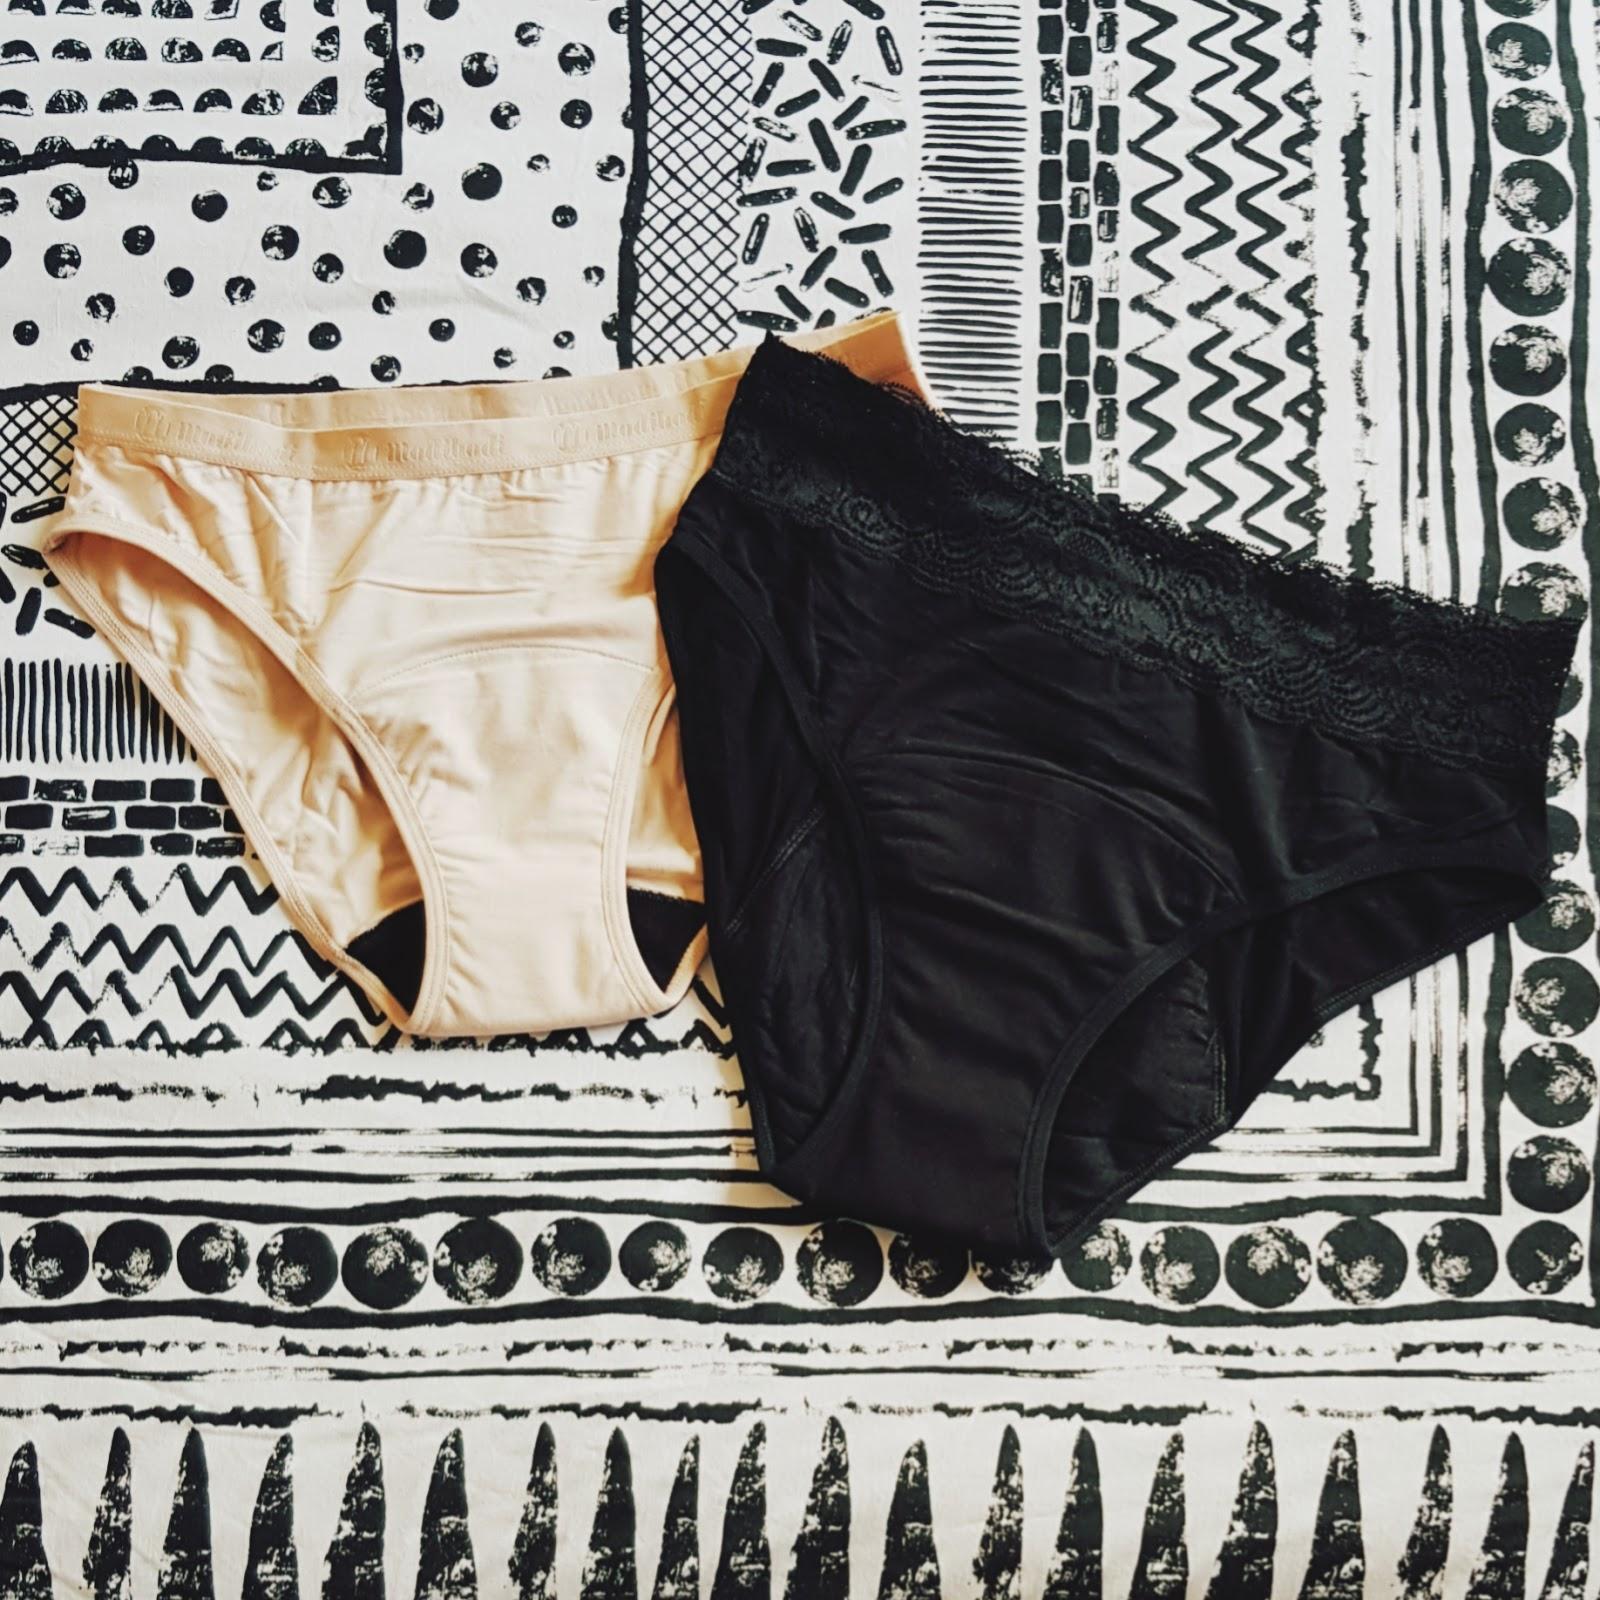 0f52899d2 Modibodi  modern underwear for every bodi.